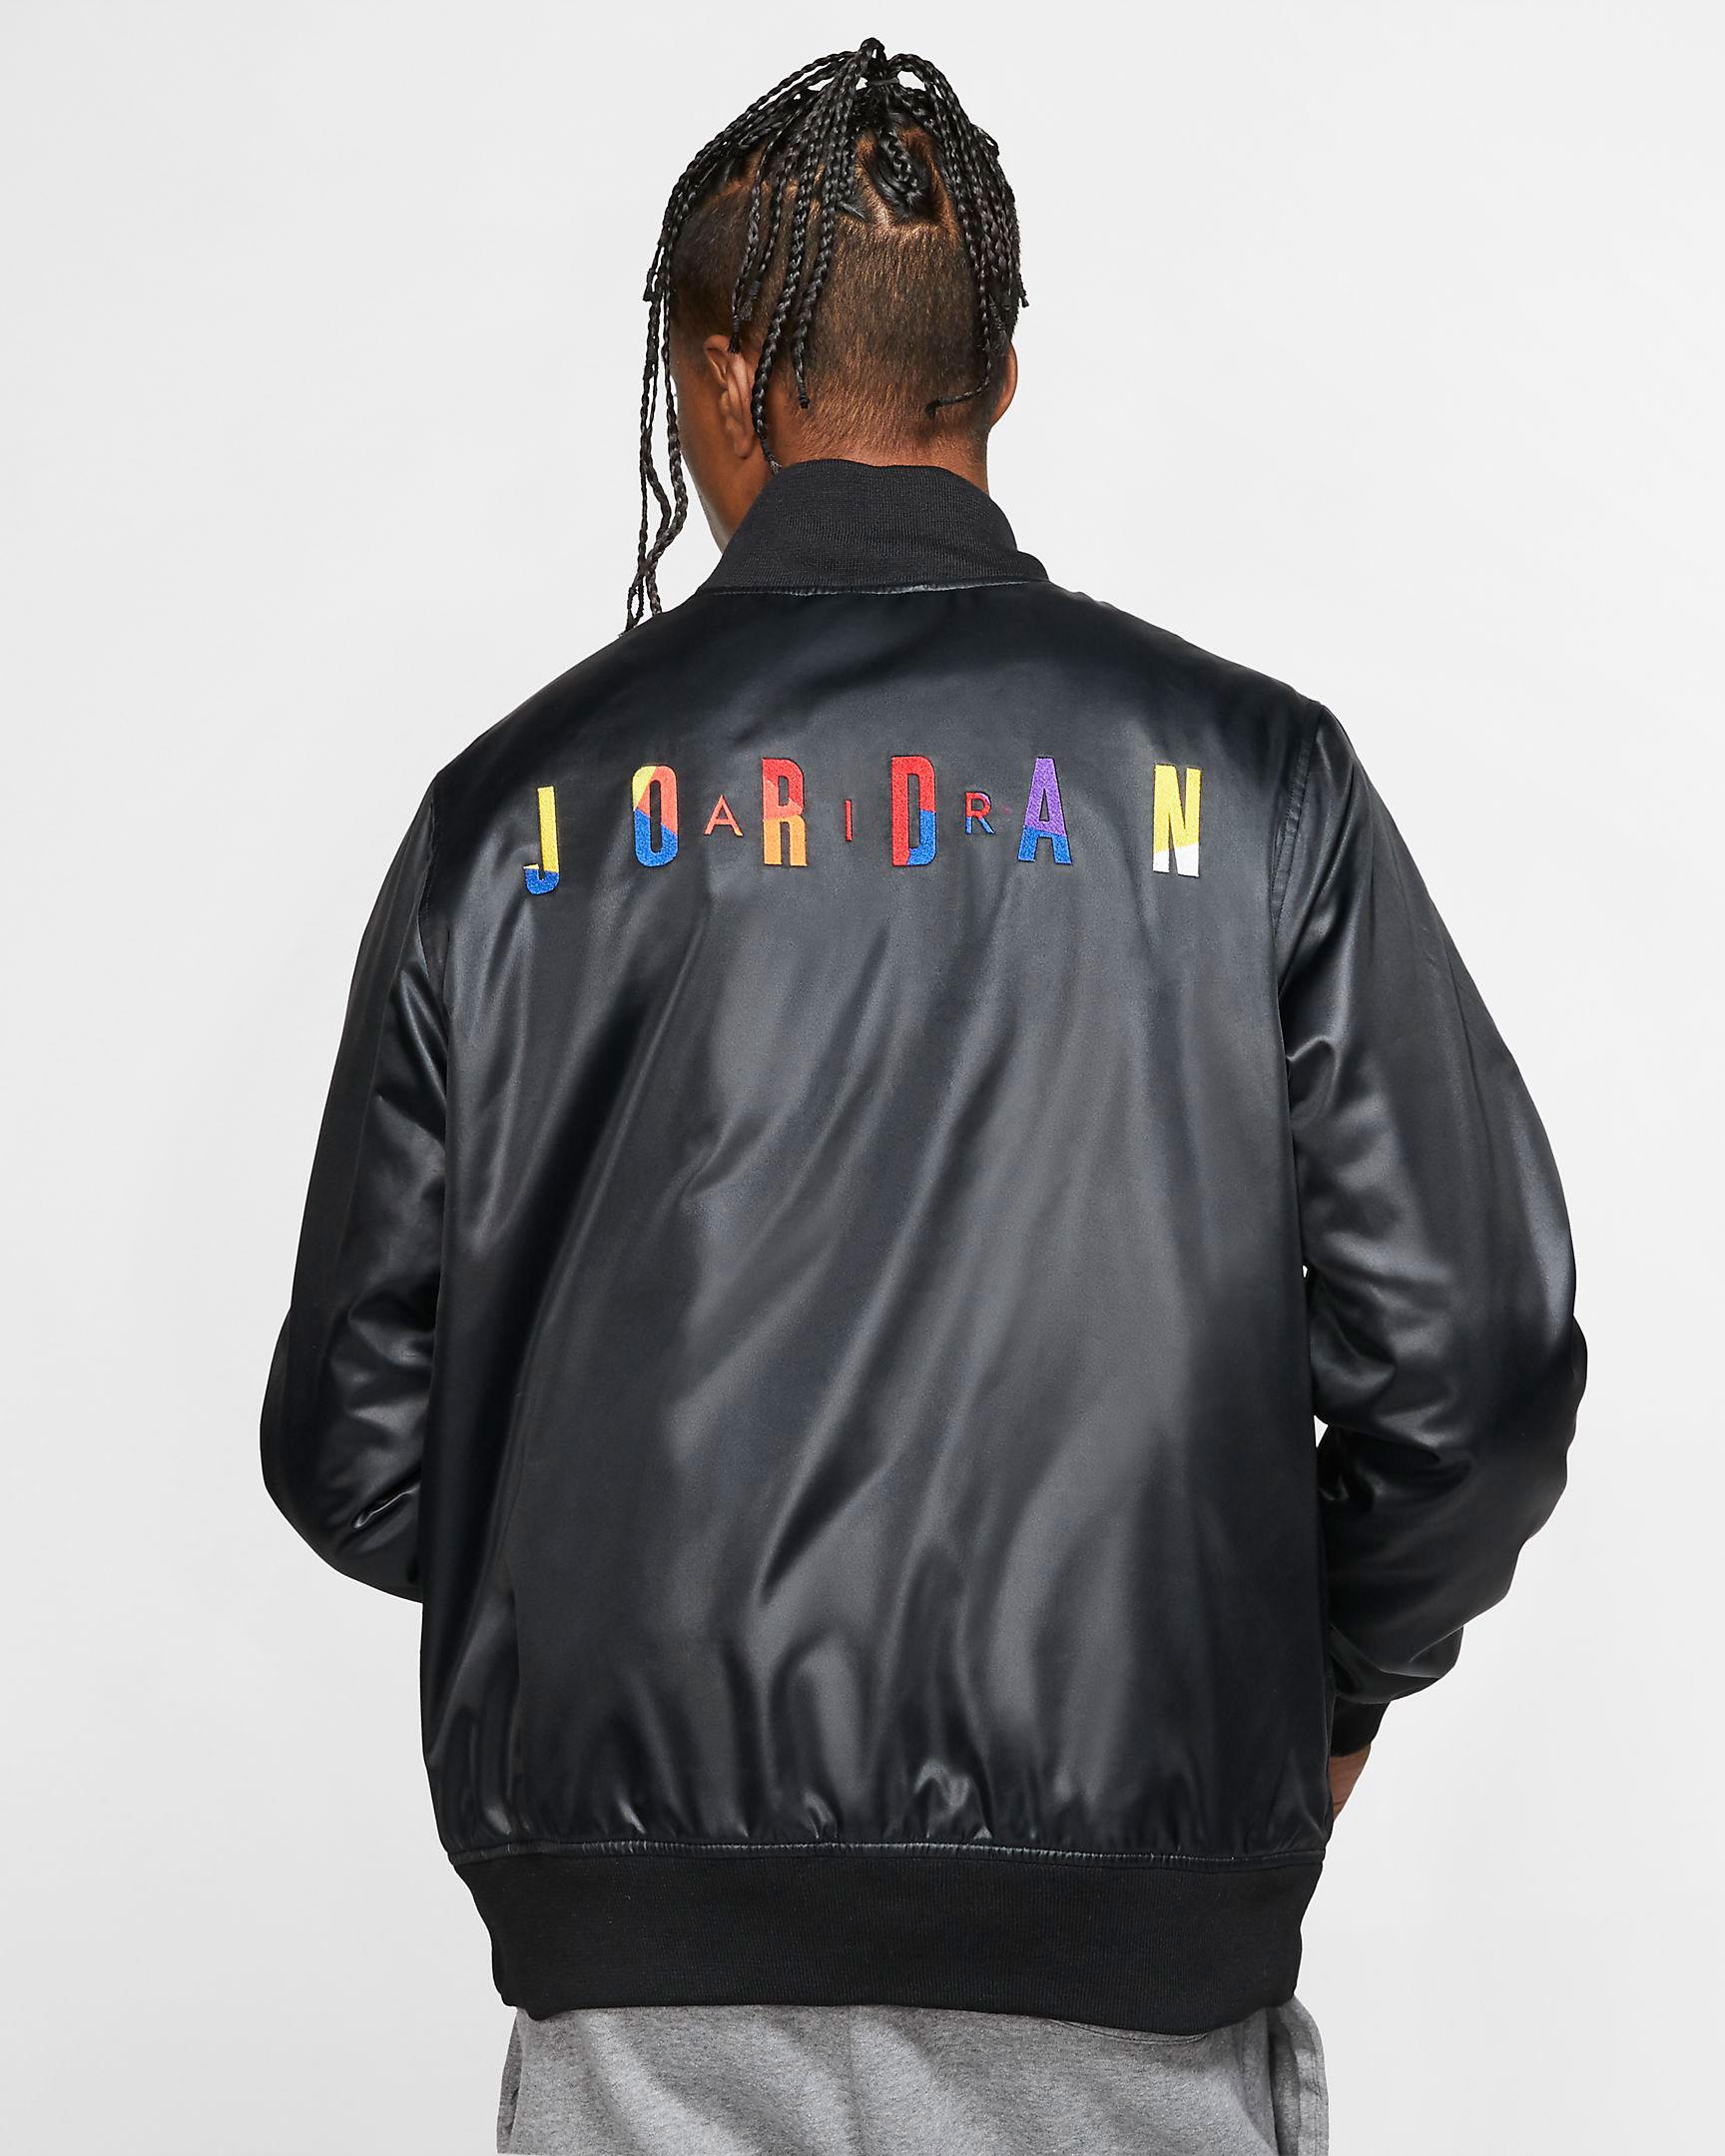 air-jordan-3-knicks-rivals-jacket-2